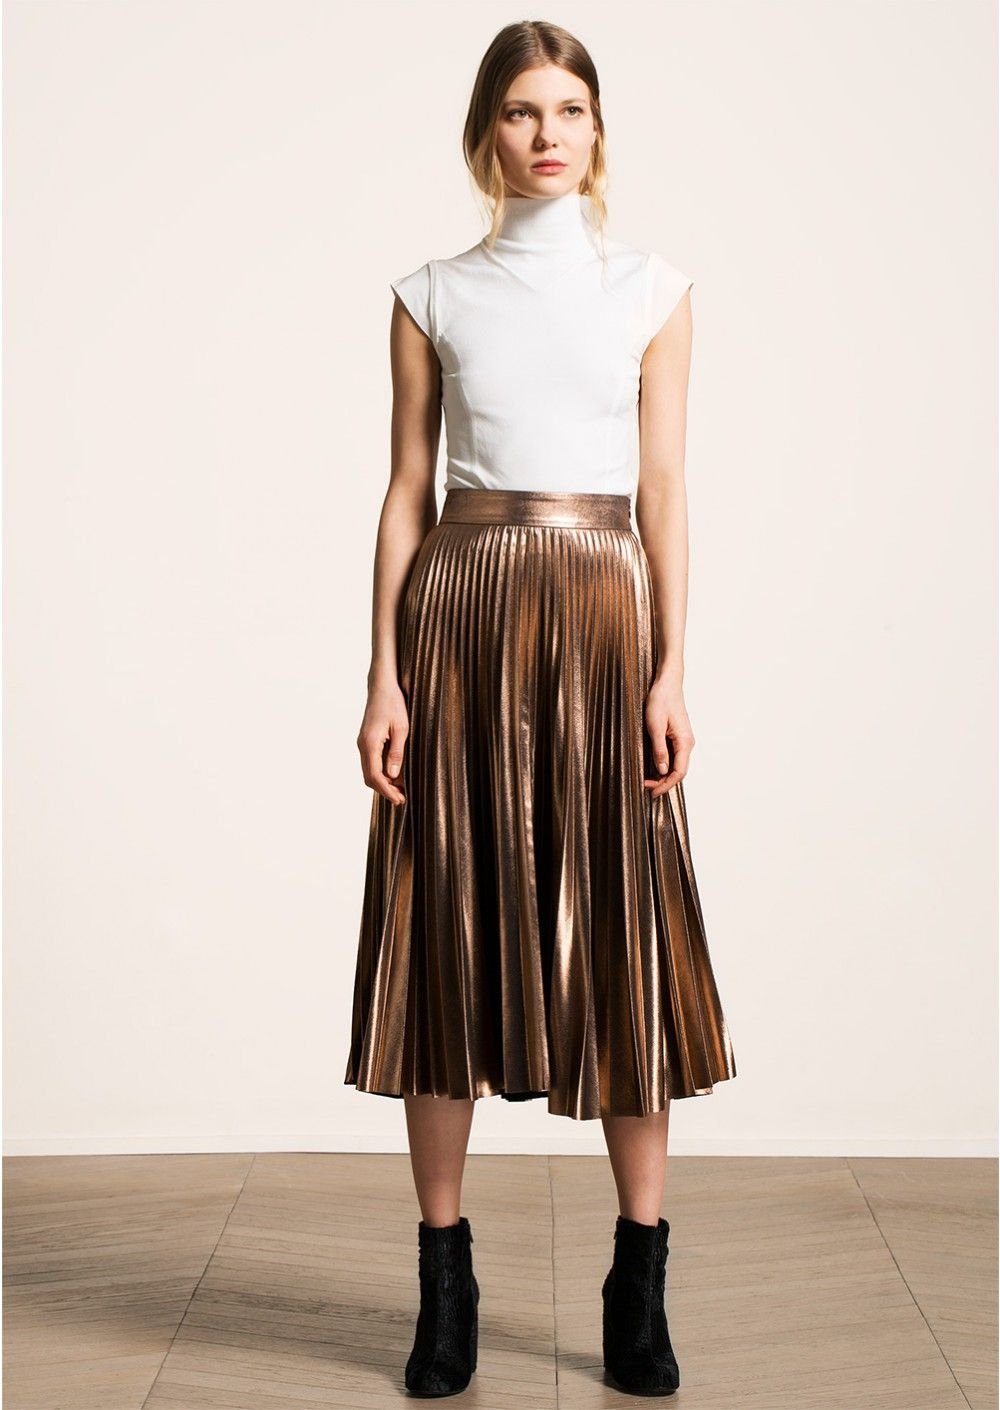 Jupe plissée métallisée bois de rose - femme - tara jarmon 2